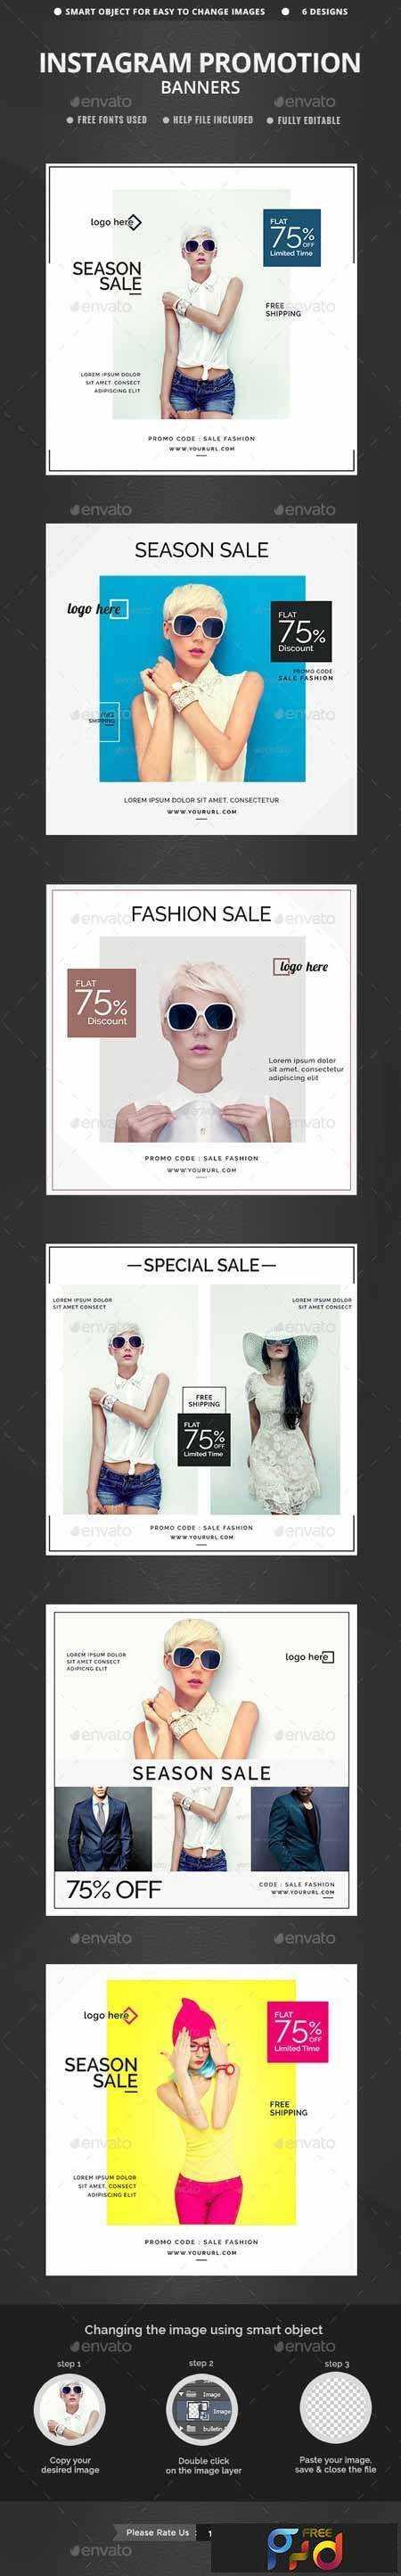 freepsdvn-com_1442897297_sales-instagram-banners-6-templates-12901326